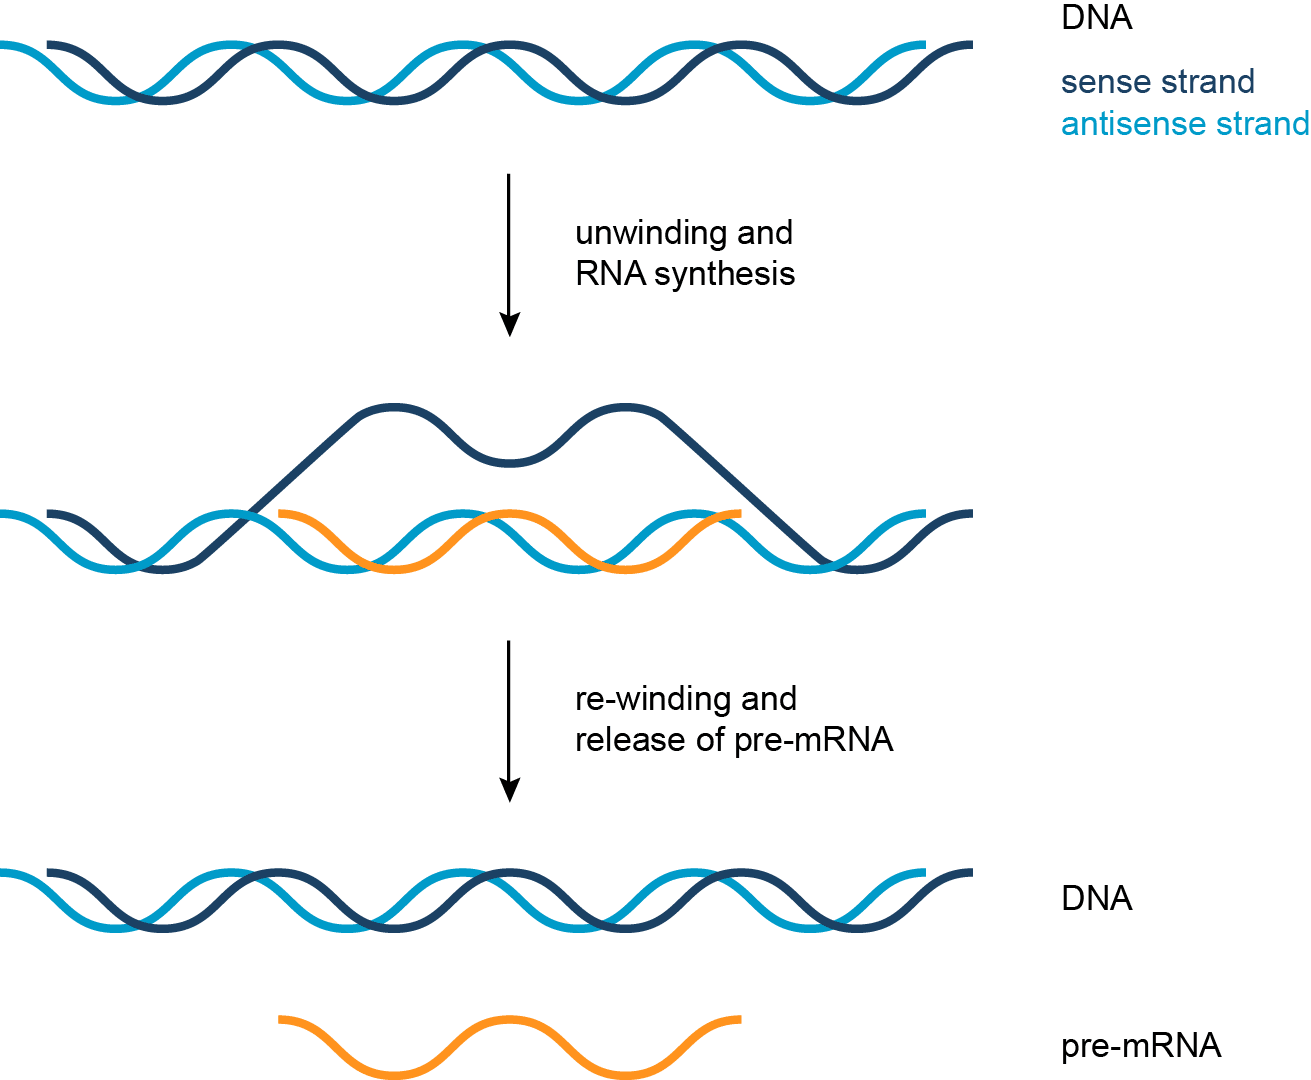 Jordan S Grade 12 Biology Blog Key Points Of Dna